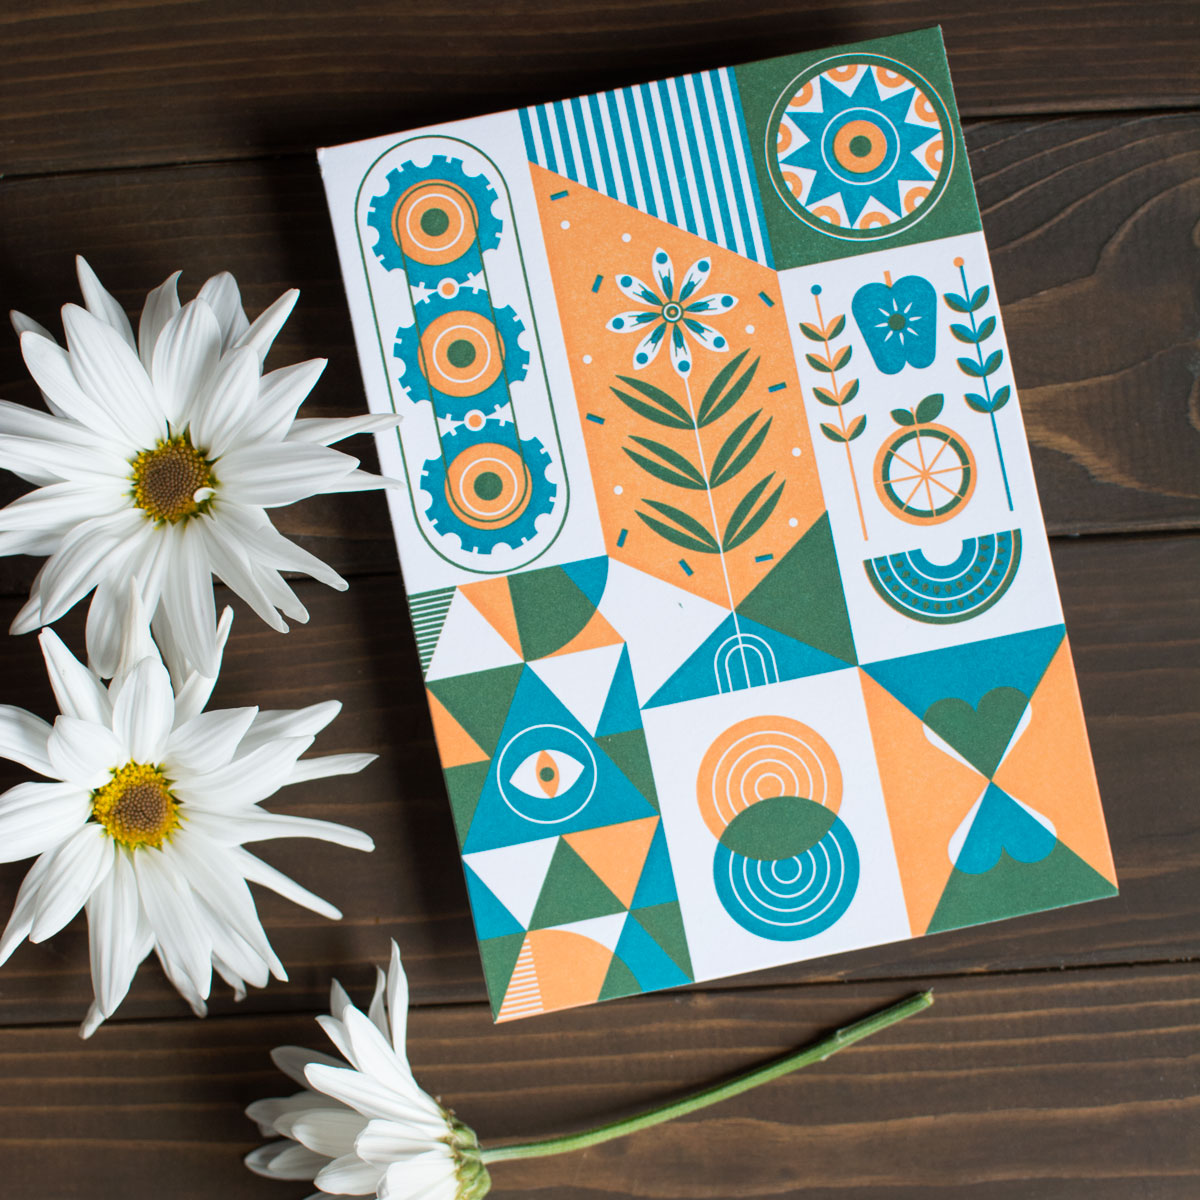 Wellness_2017_Holstee_flowers-1200px.jpg